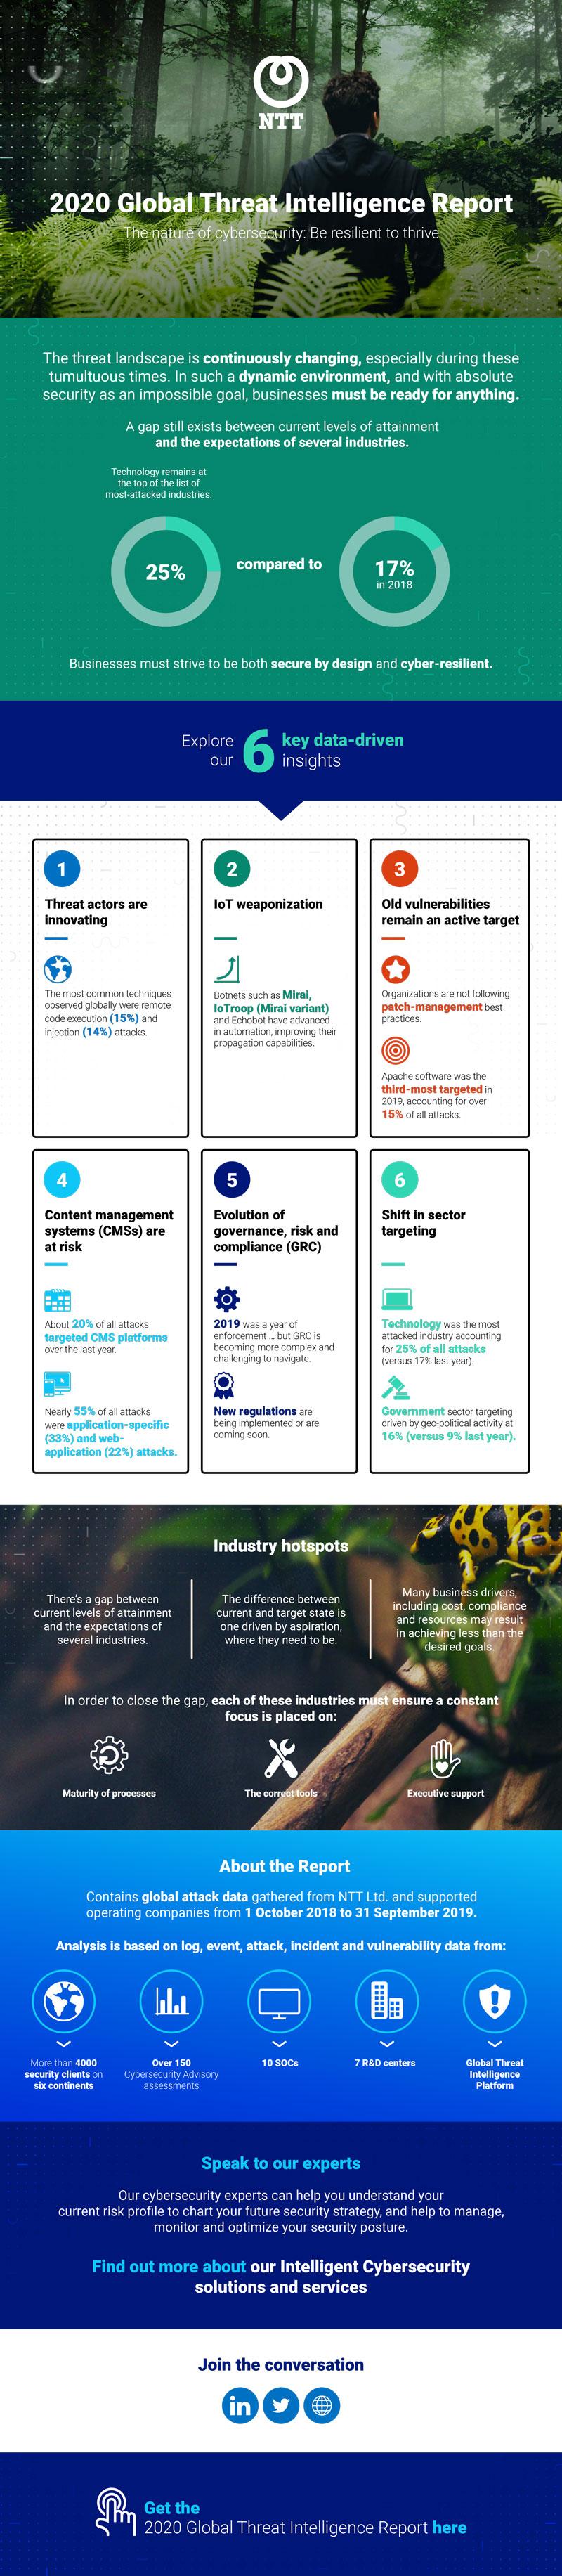 Ntt - 2020 Global Threat Intelligence Report